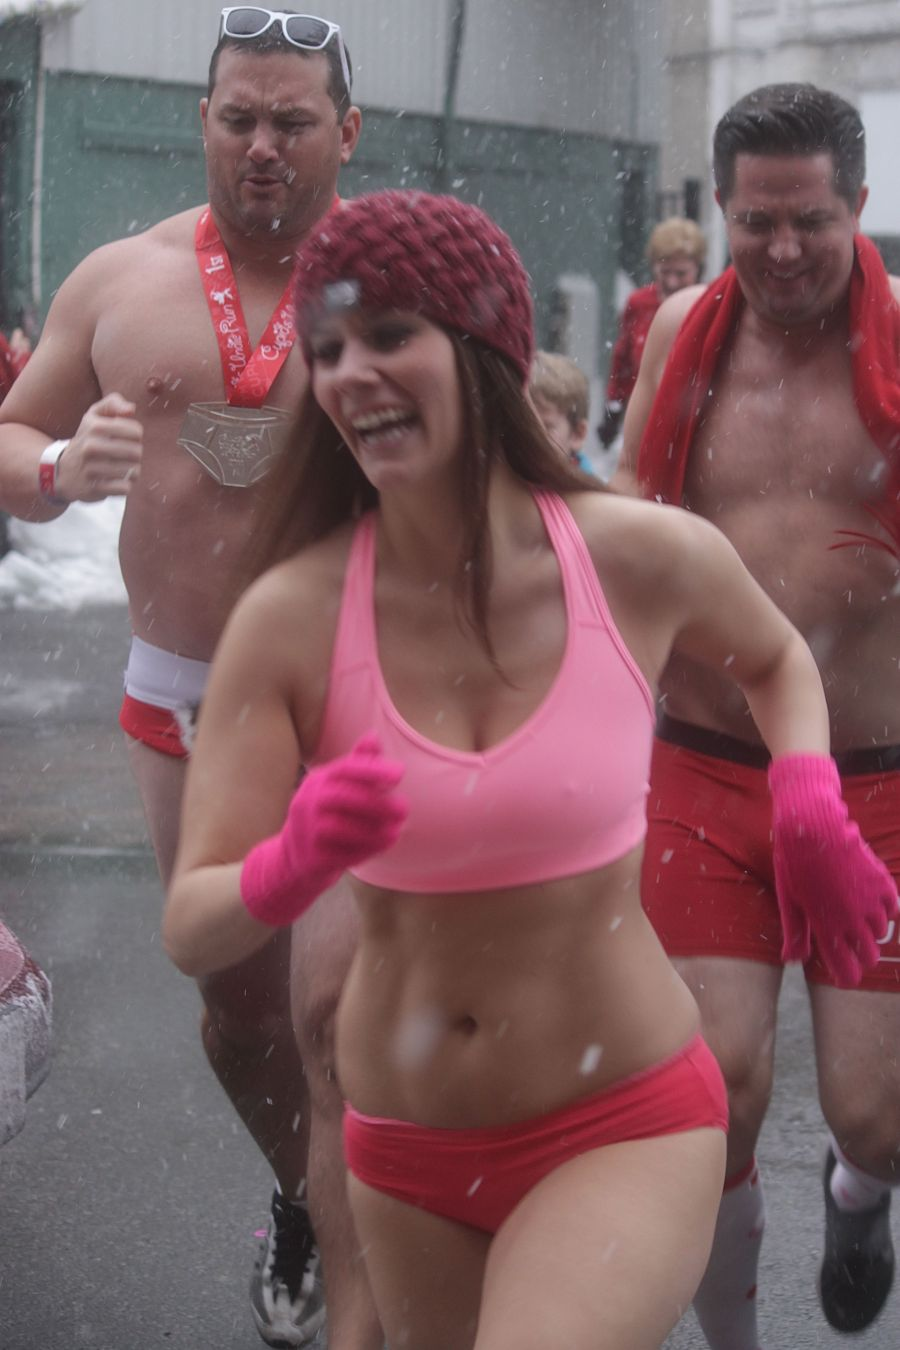 boston cupid undies run february 15 47